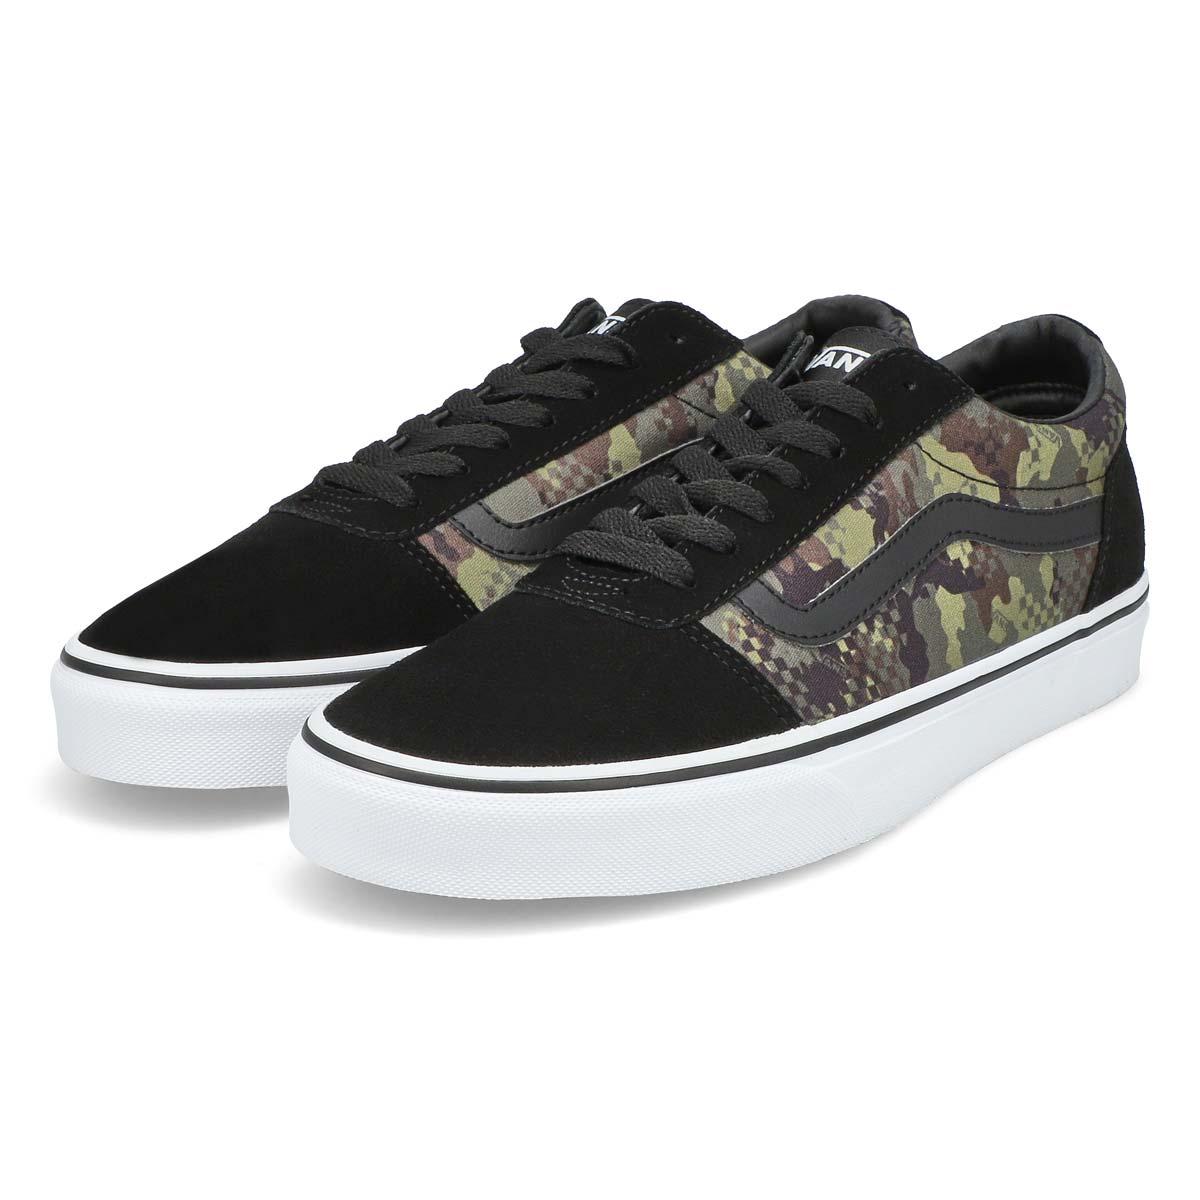 Men's Ward Sneaker - Mixed Camo/Black/White